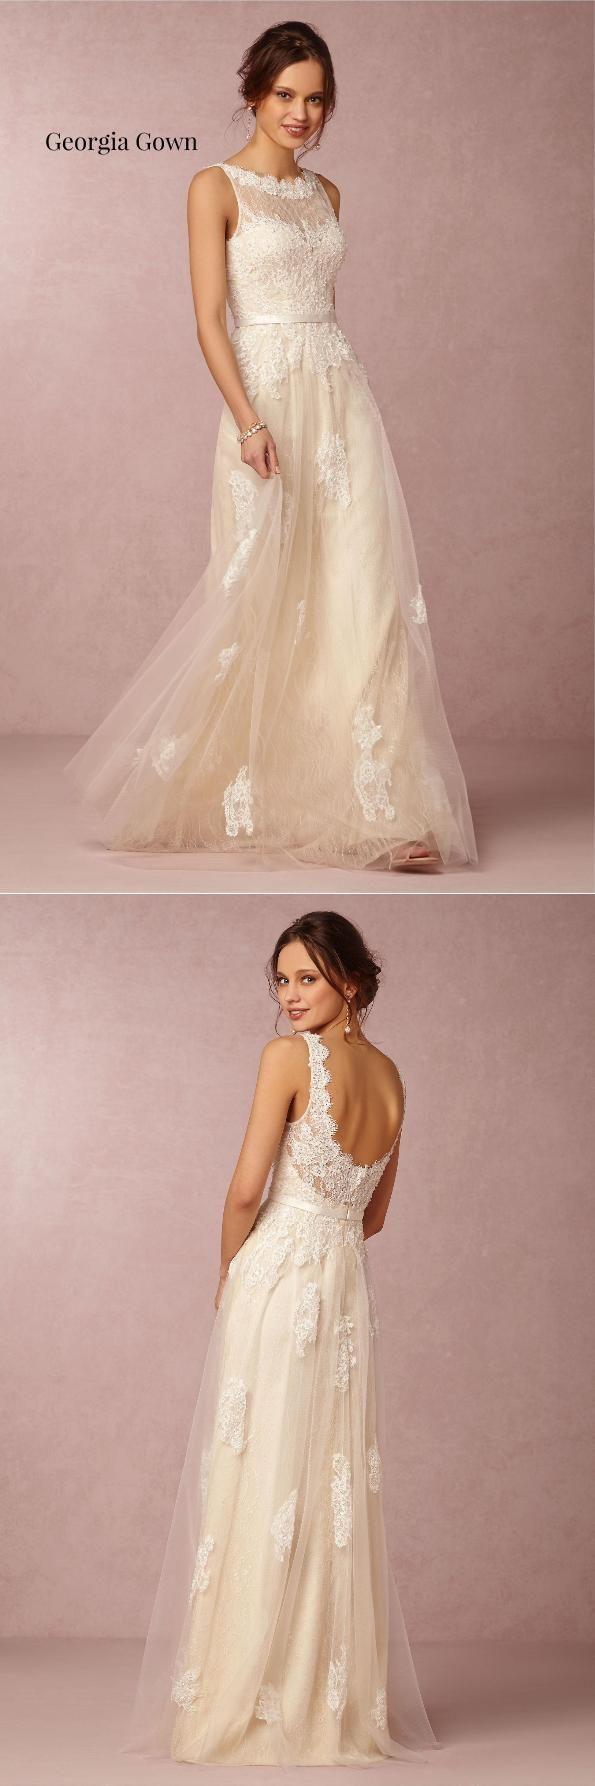 19 best Allurez Design Your Own Engagement Ring images on Pinterest ...